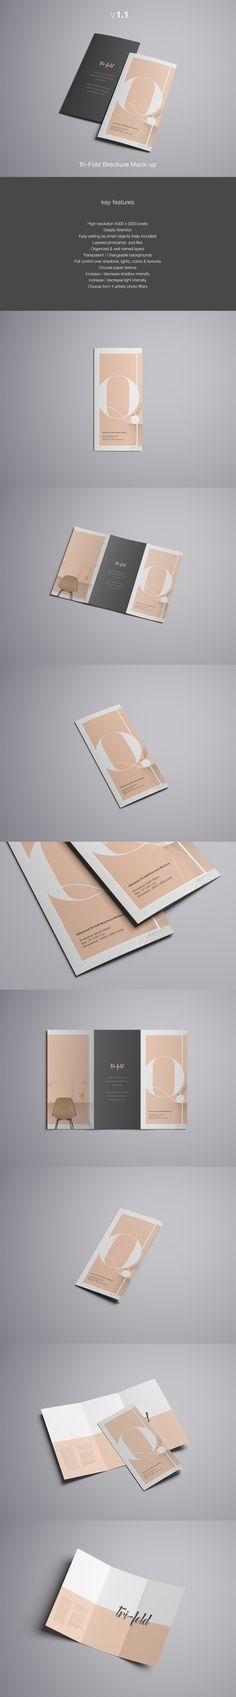 Advanced Tri-Fold Brochure Mockup - PSD on Behance